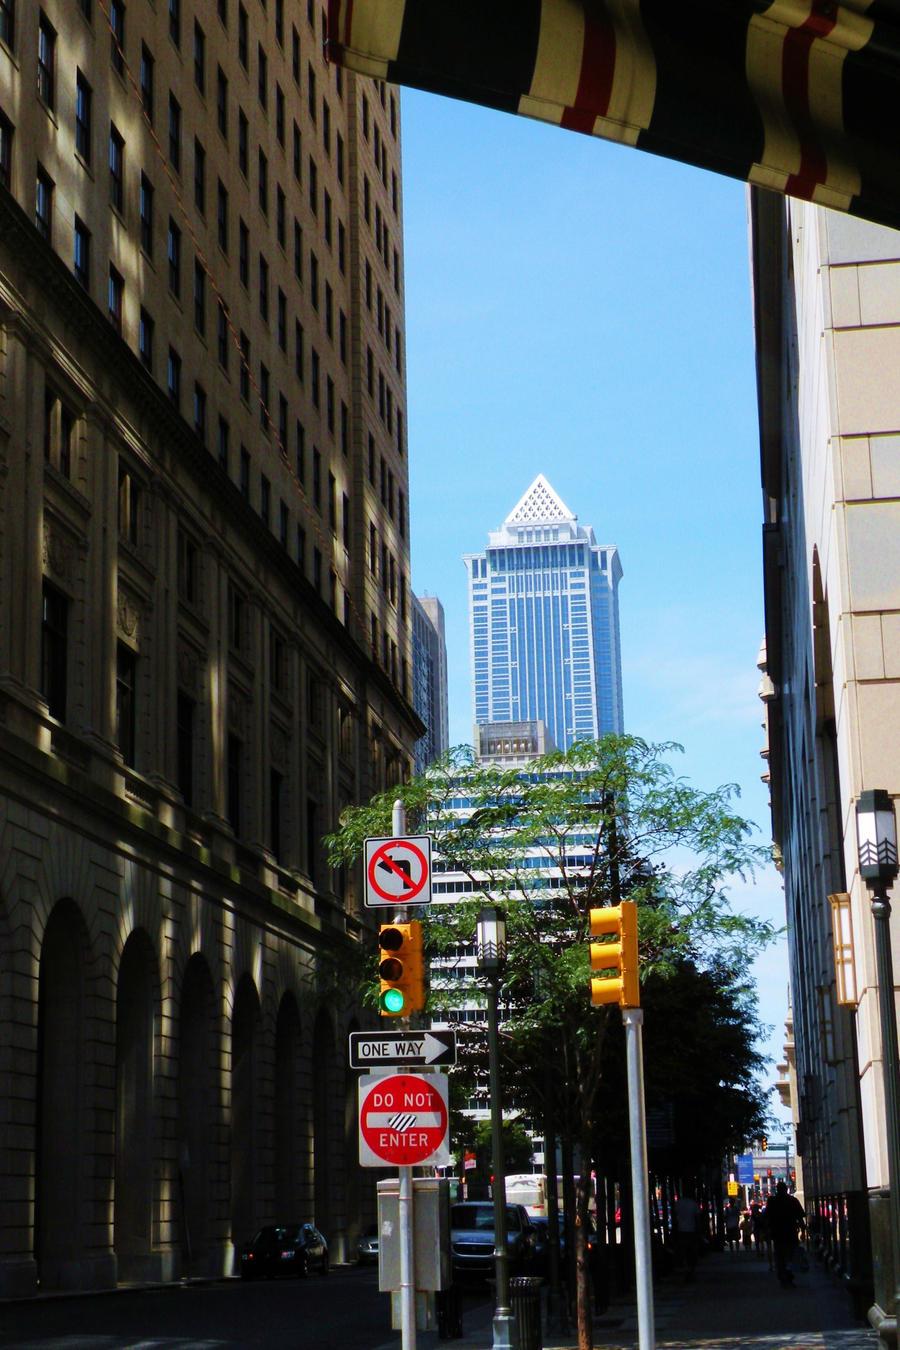 City Street by FrigidRose